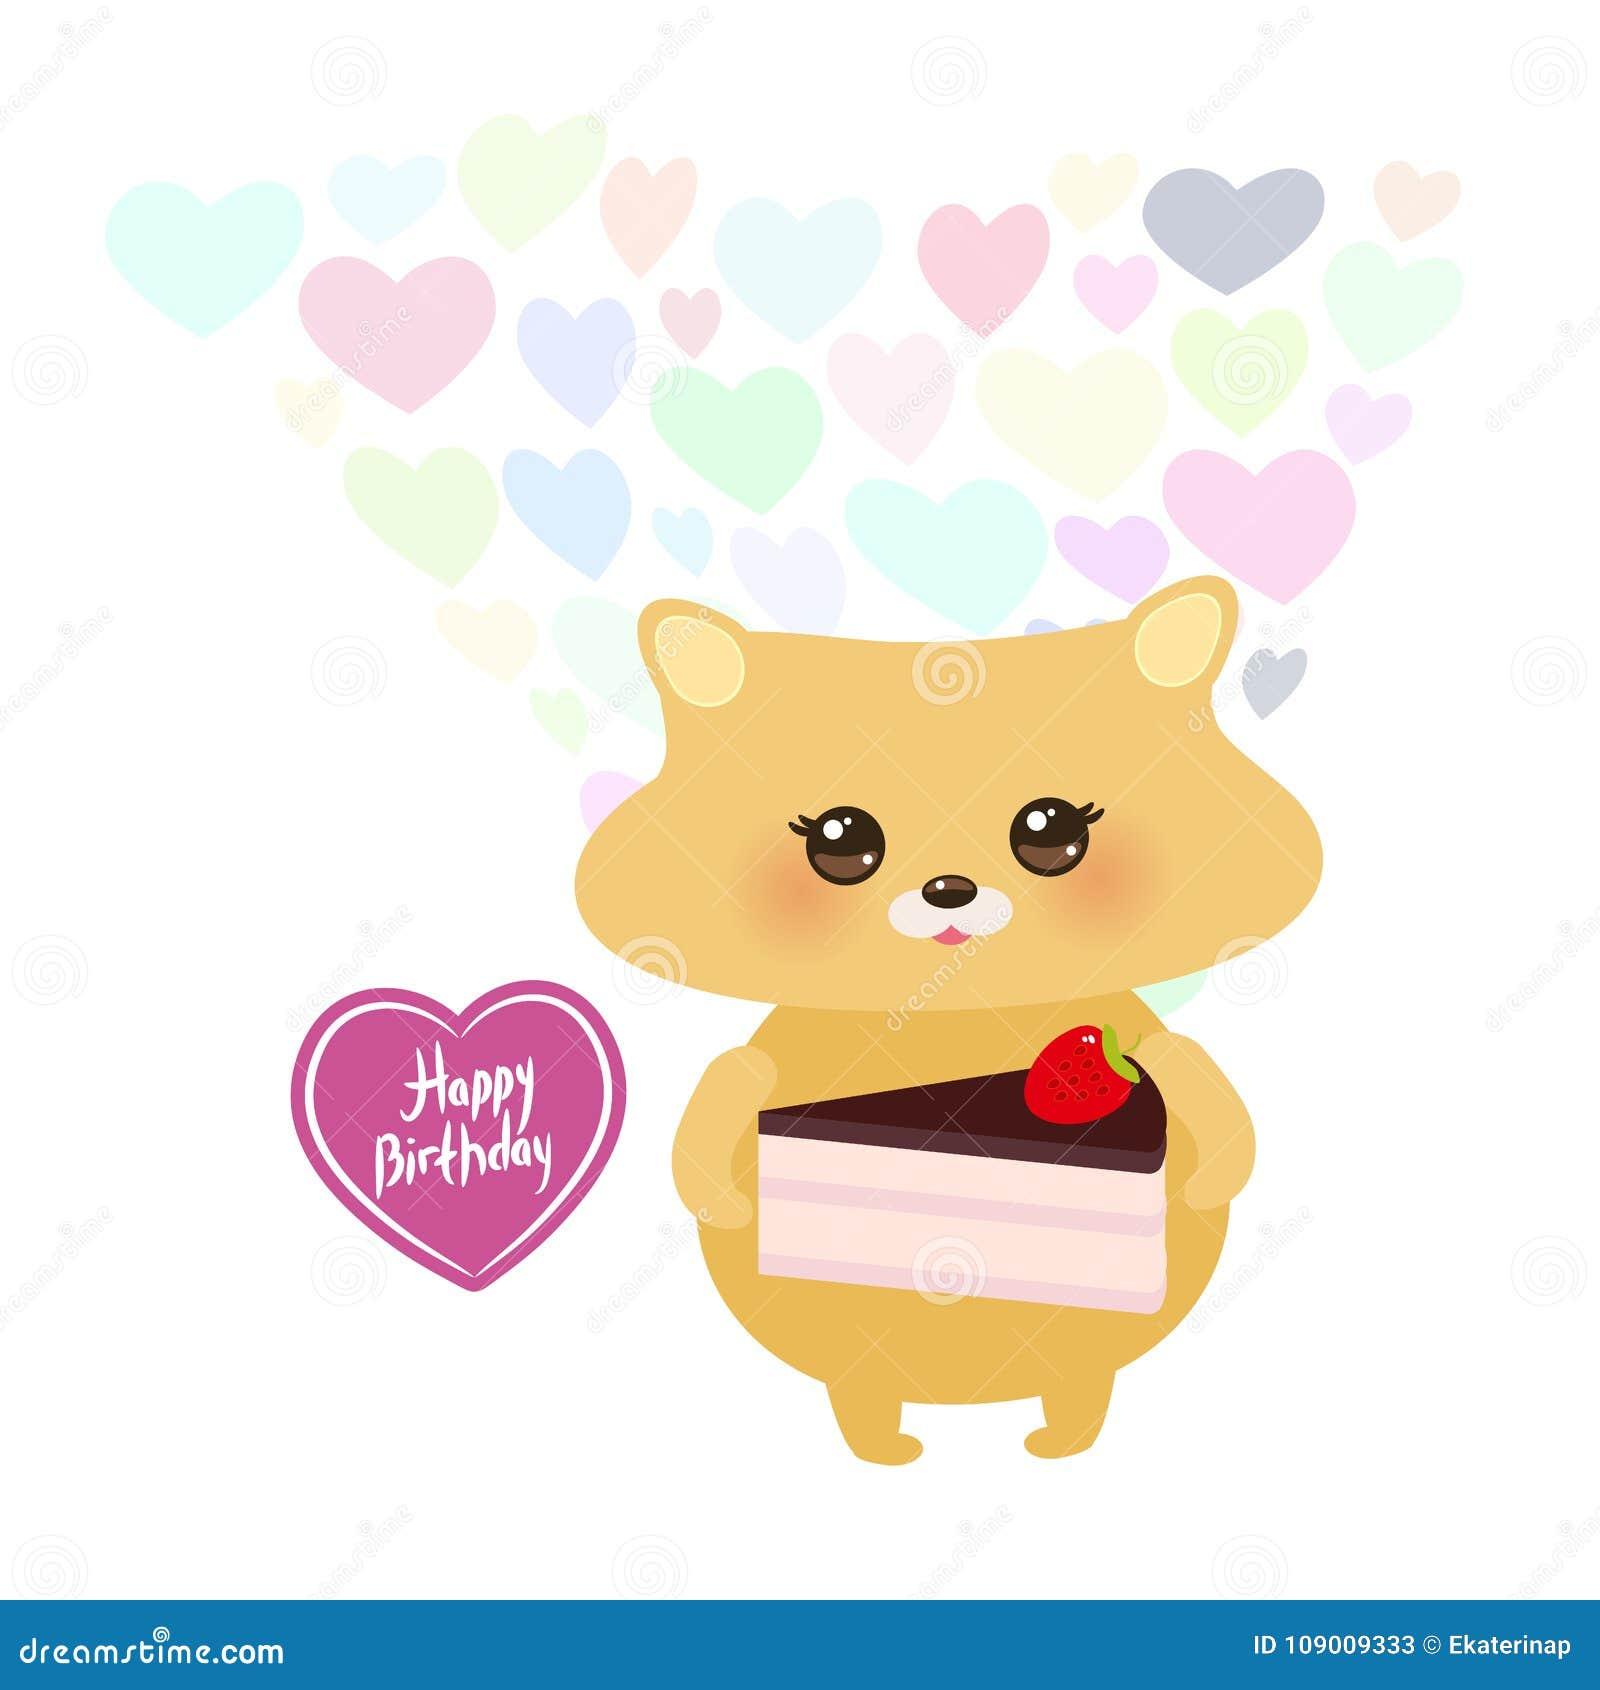 Happy Birthday Card Cute Kawaii Hamster With Fresh Strawberry Cake